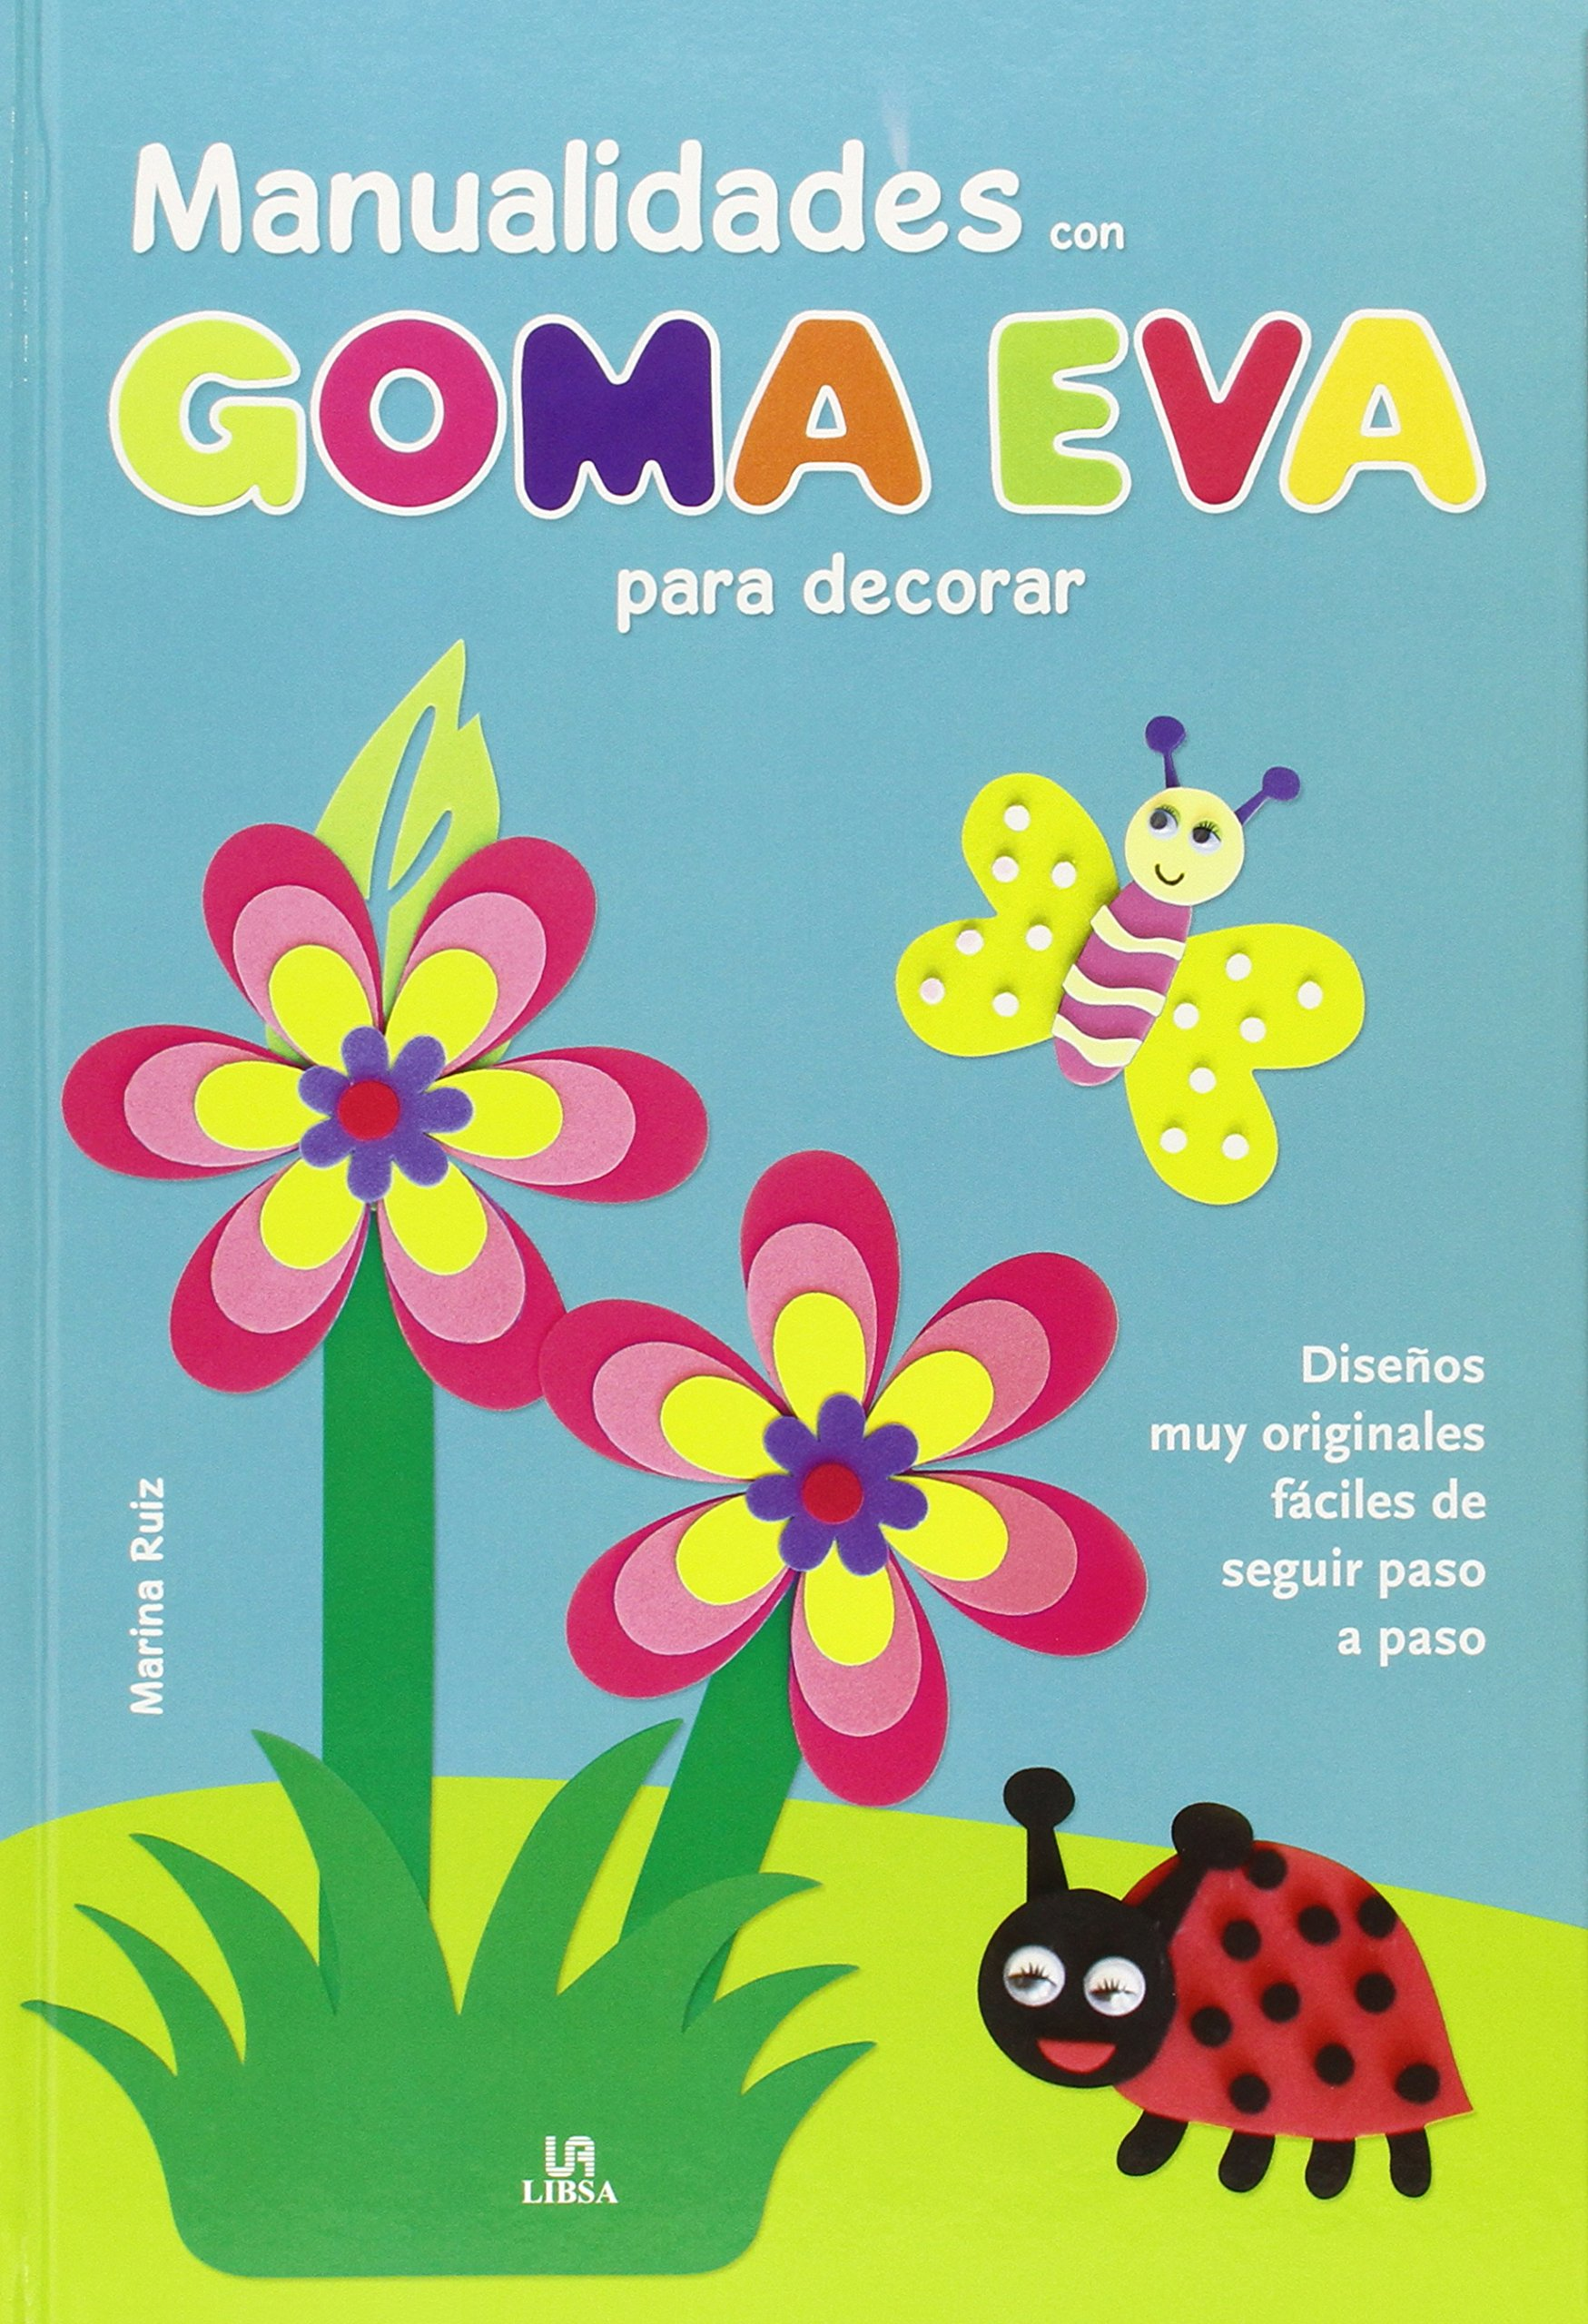 Manualidades con Goma Eva para Decorar (Spanish) Hardcover – 2013